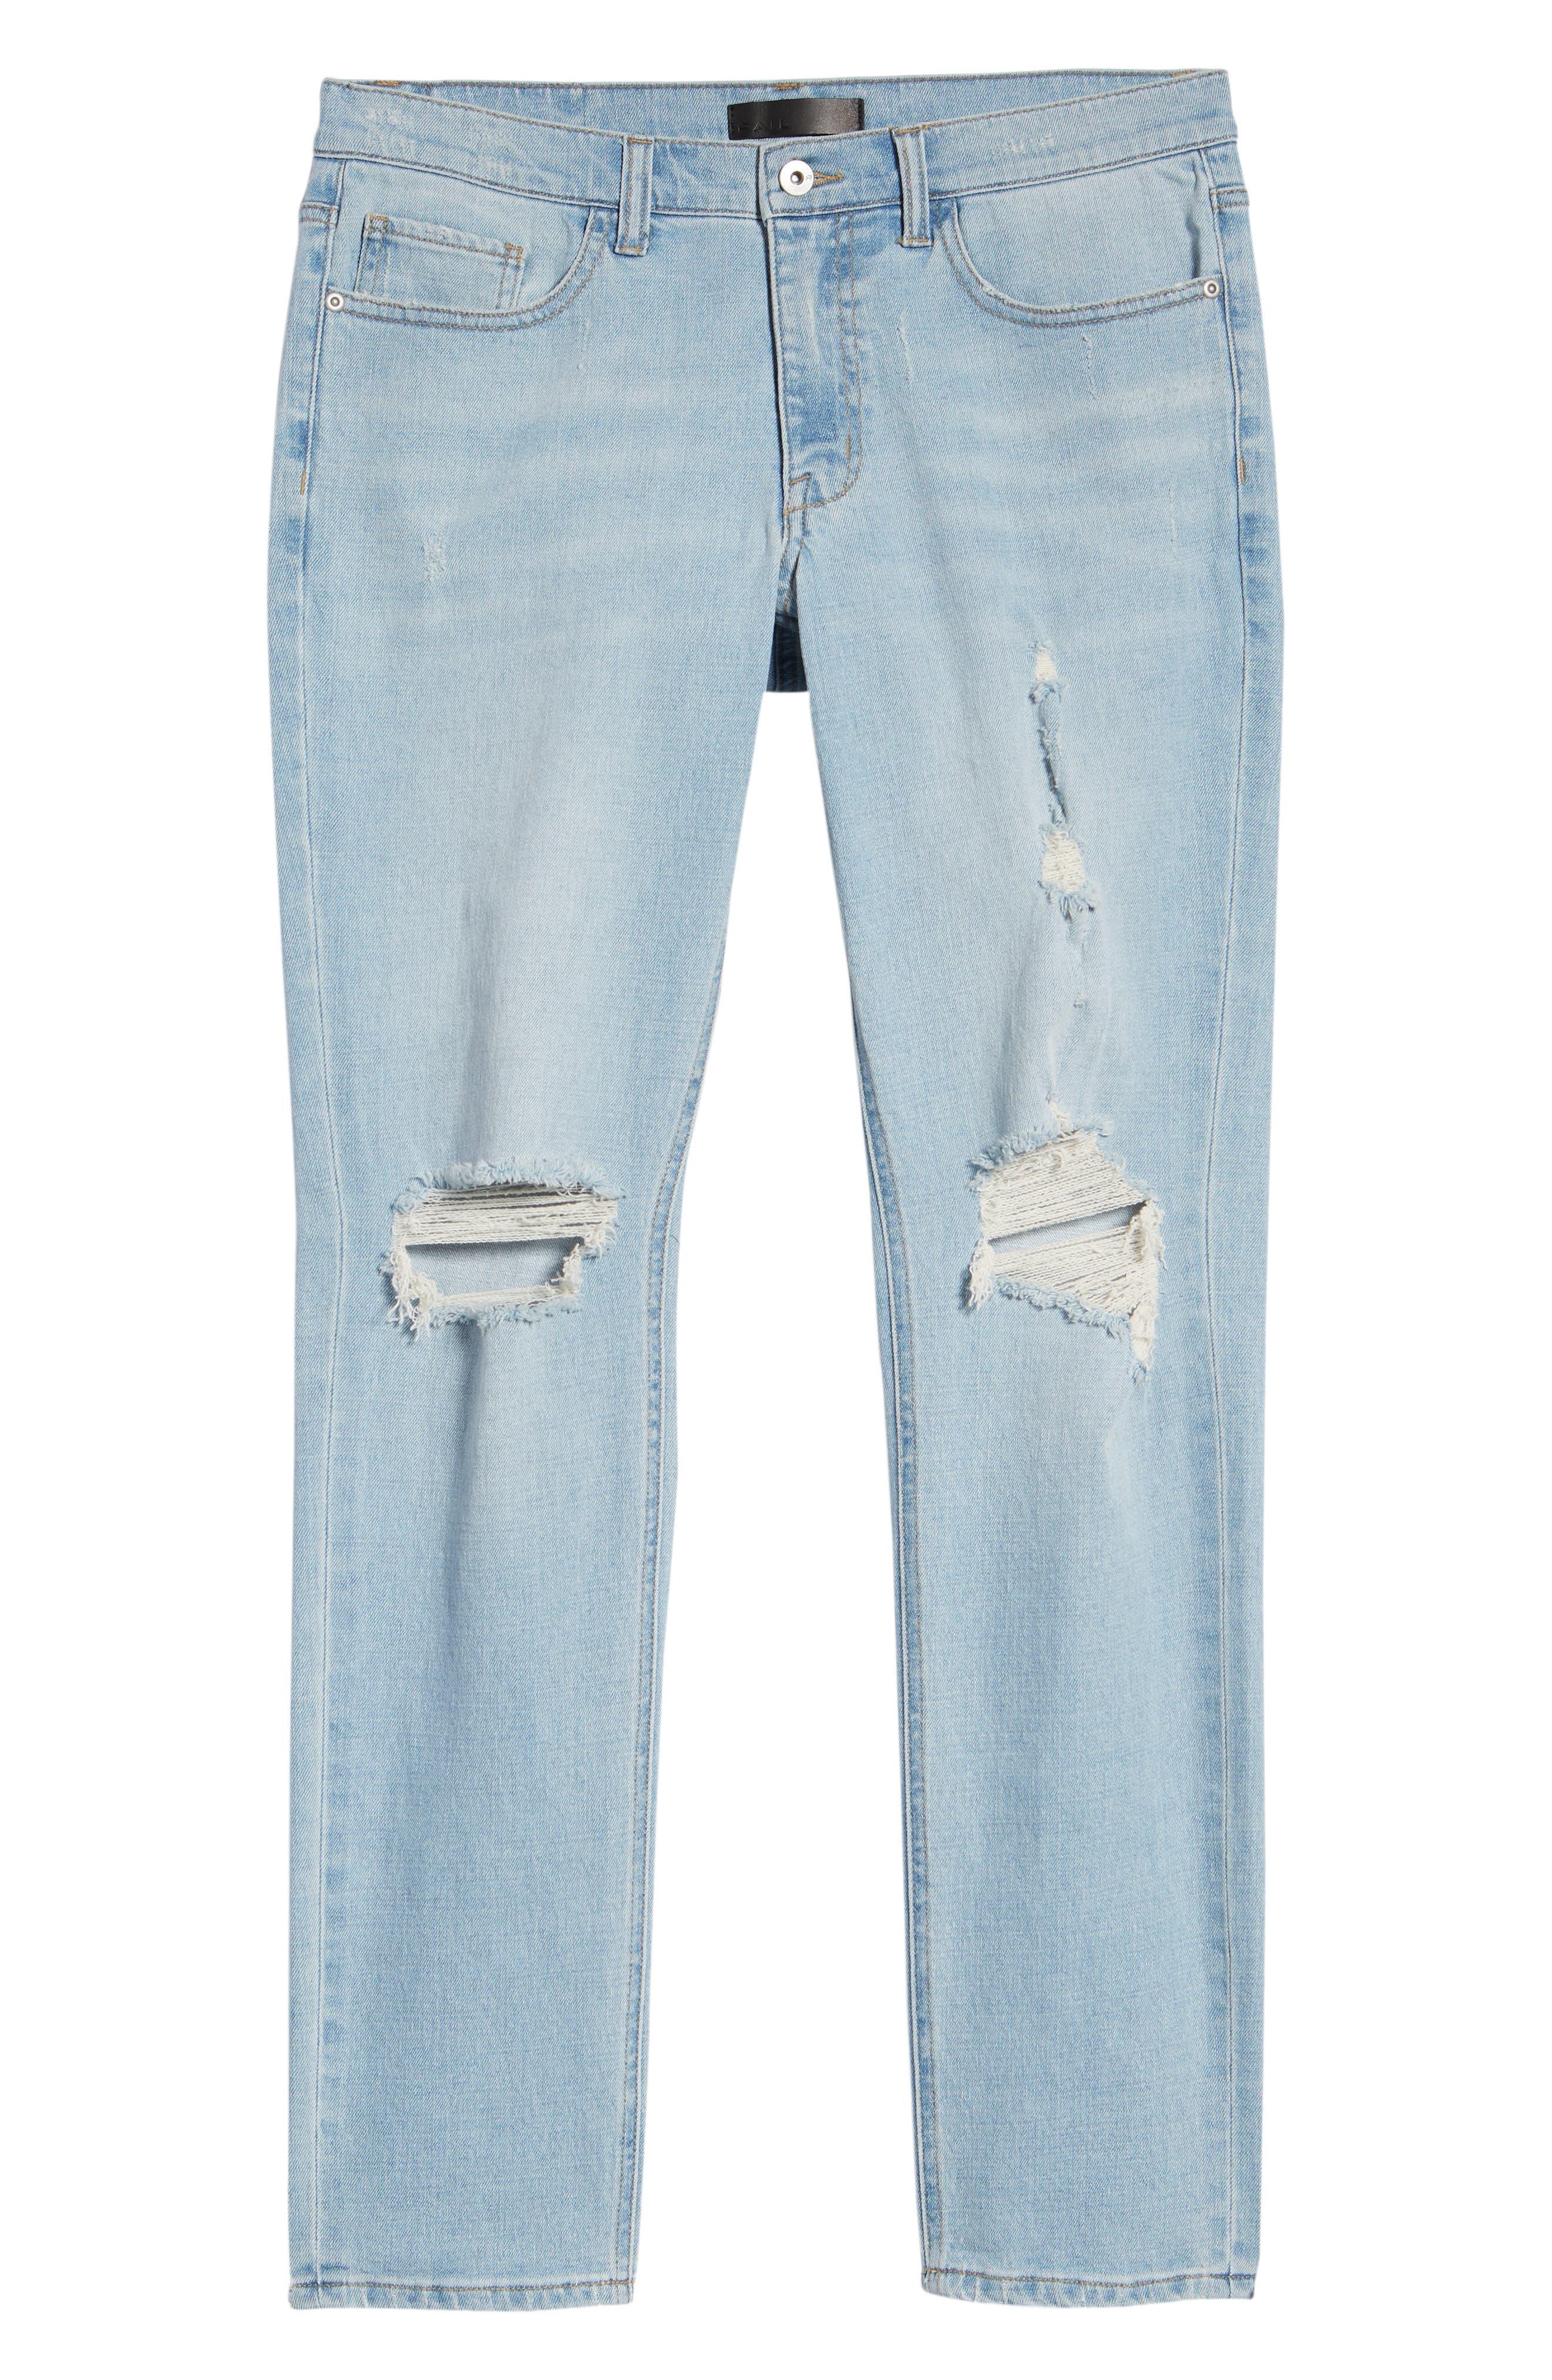 Ripped Skinny Jeans,                             Alternate thumbnail 6, color,                             BLUE CORGAN WASH